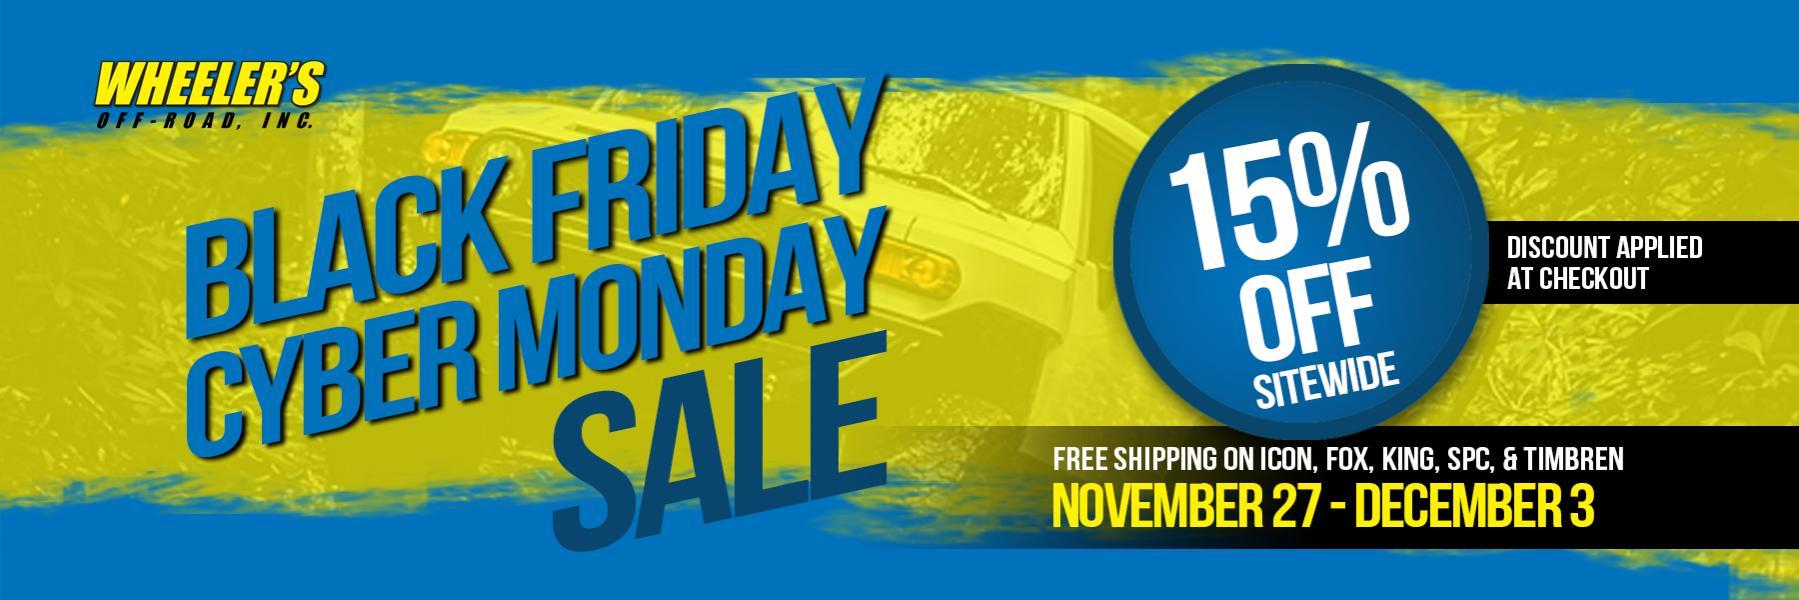 Wheeler's Off-Road Black Friday Sale 2019!-wor-black-friday-website-banner-jpg